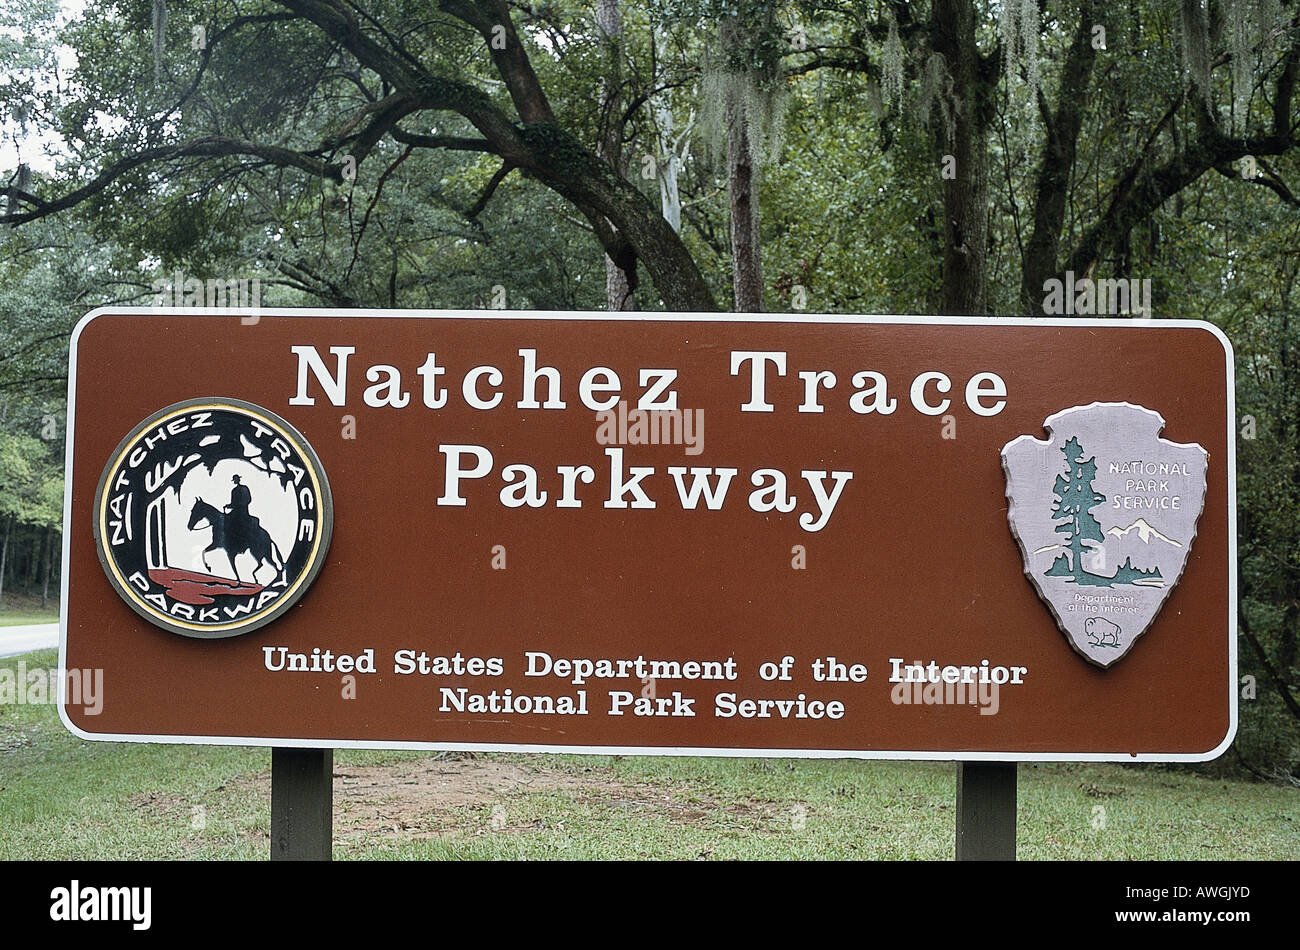 Natchez Trace Stock Photos Natchez Trace Stock Images Alamy